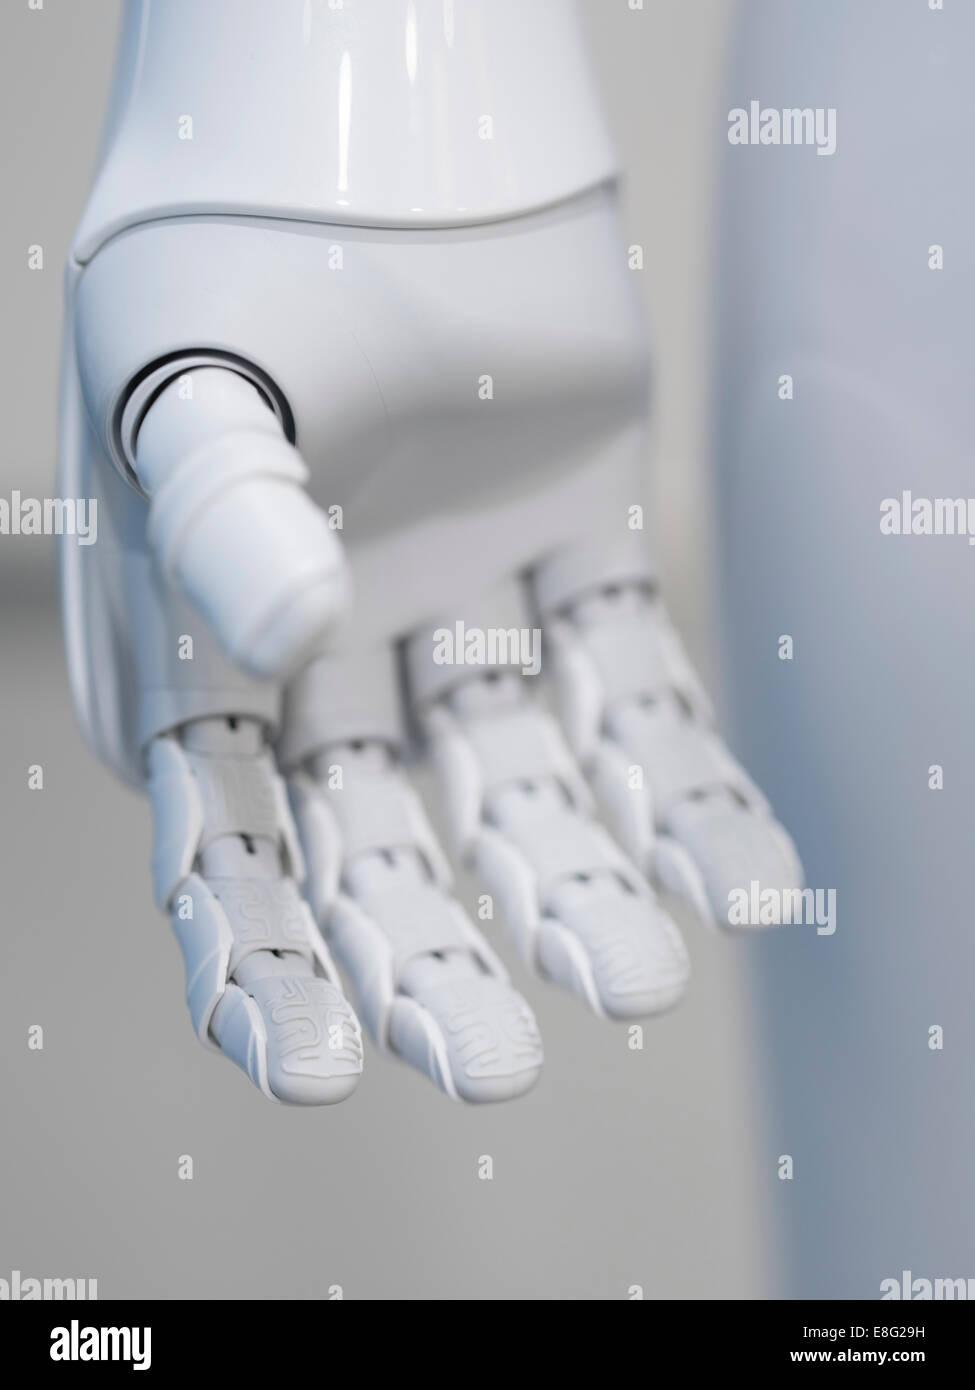 Pepe un robot umanoide da Aldebaran Robotics e SoftBank Mobile. All'Aoyama Softbank Store, Tokyo, Giappone. Immagini Stock